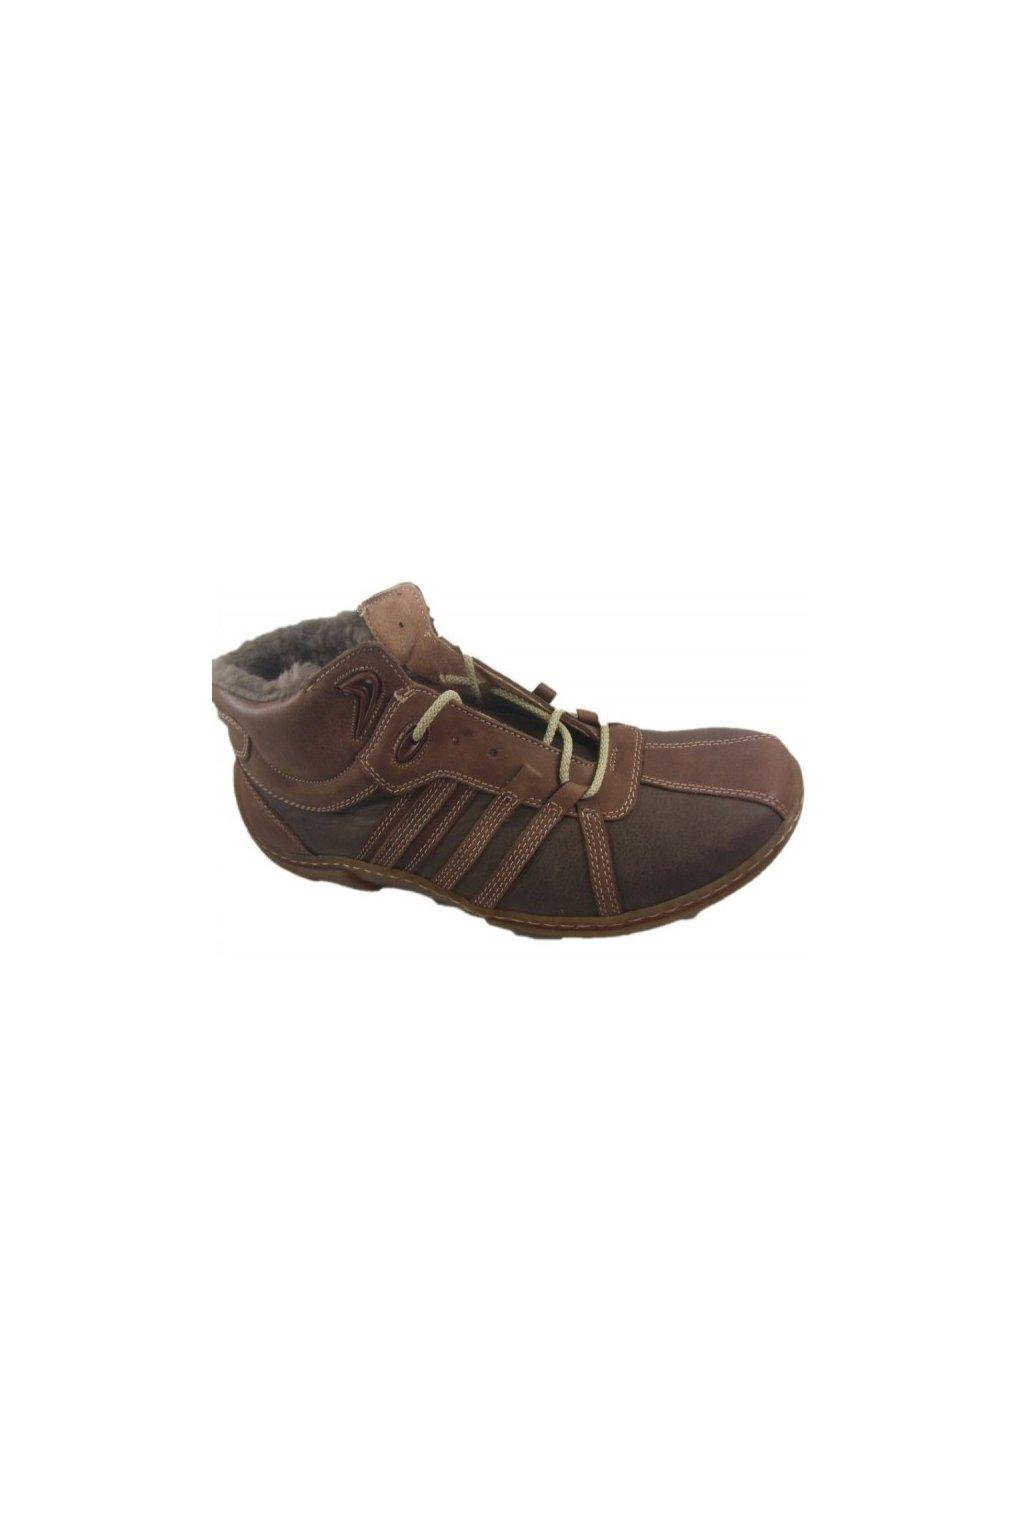 Nadměrná pánská obuv Kuda 566 beran